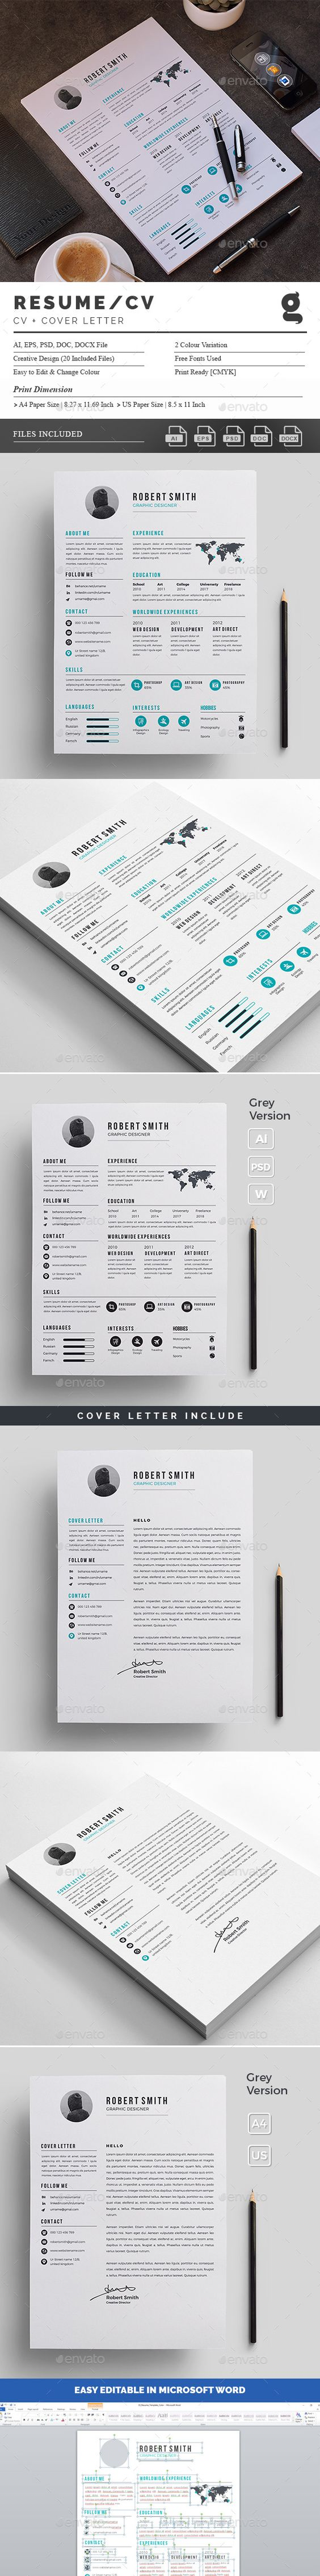 resumes photoshop psd designer letterhead  resumes photoshop psd designer letterhead 10141 graphicriver